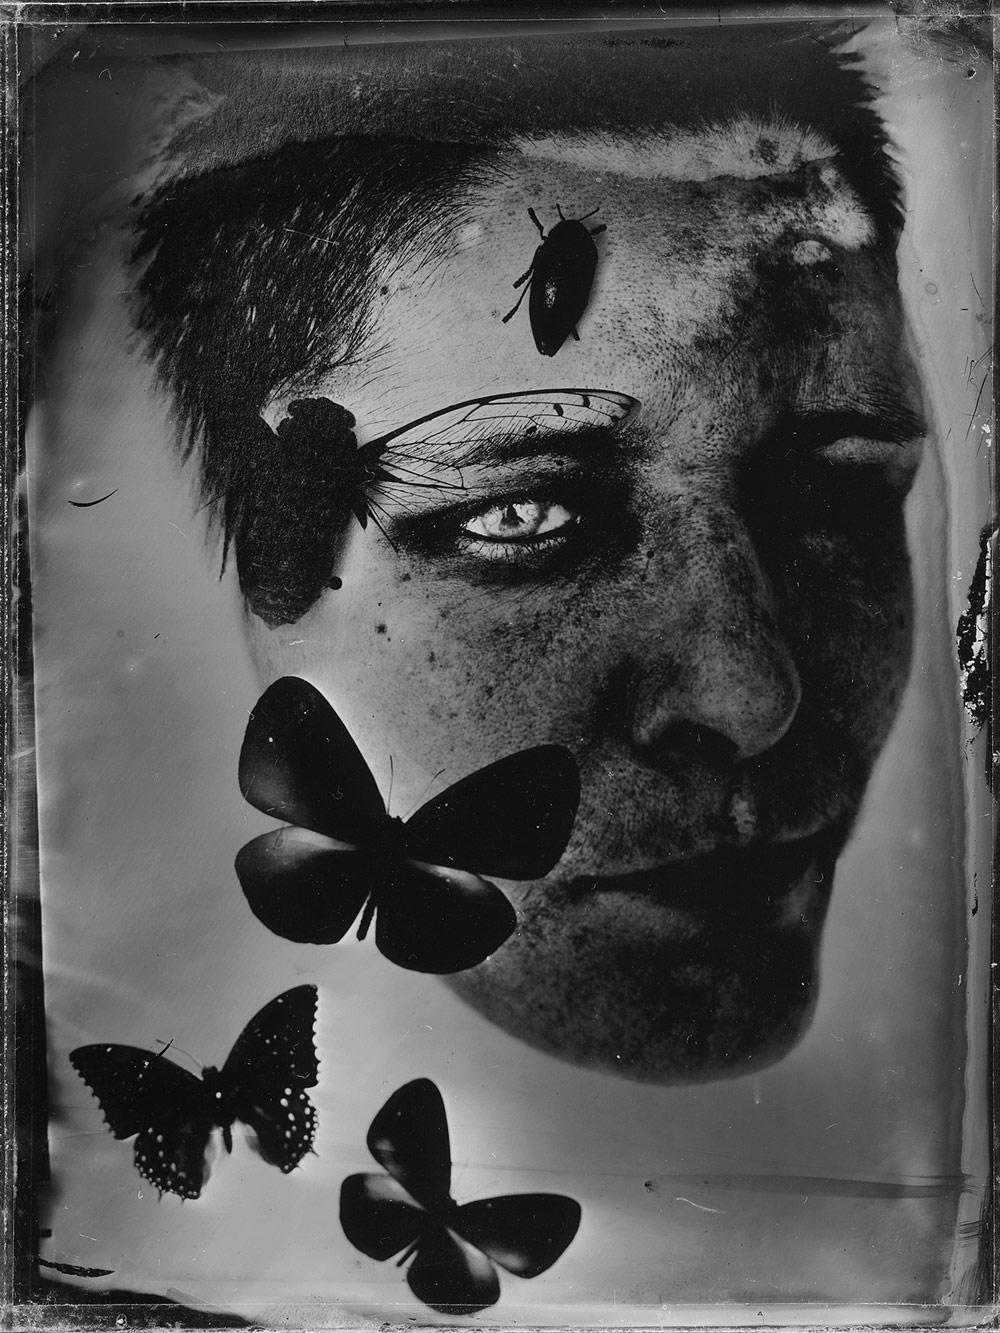 About yourself. Hybrids, © Marzena Kolarz, Krakã³W, Poland, Professional : Self-Portraits, PDN Faces - Portrait Photography Contest